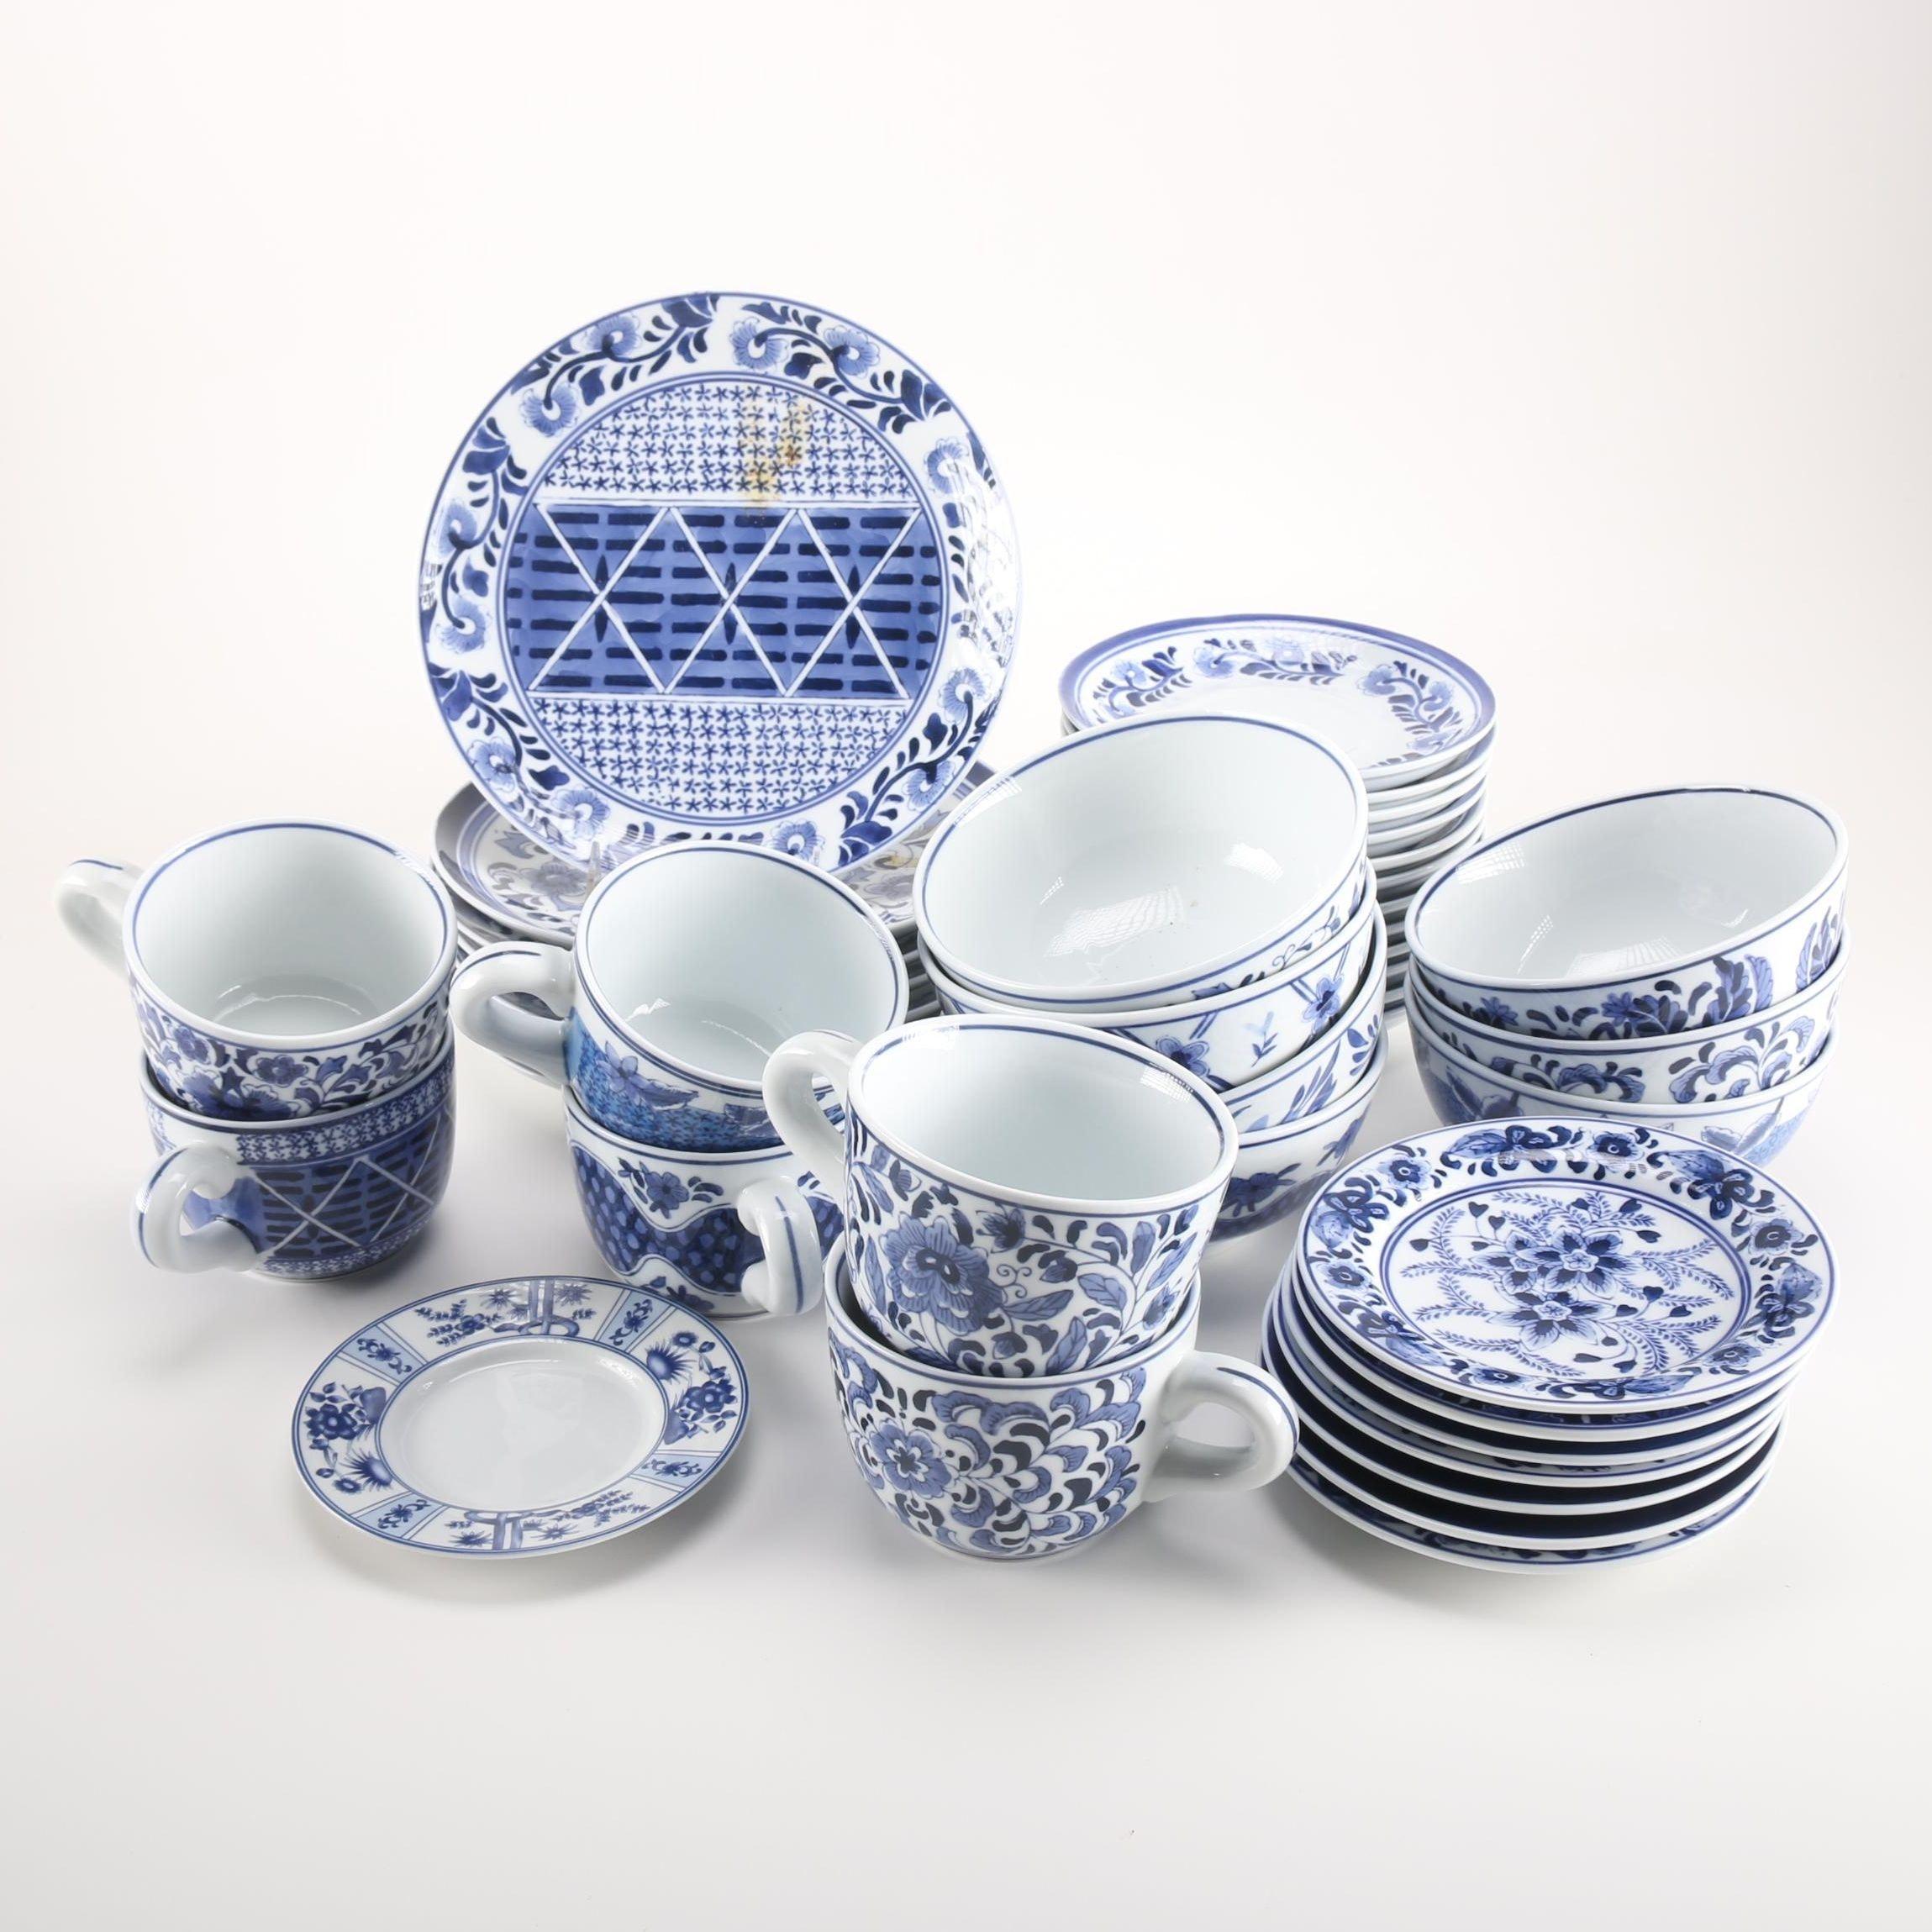 Blue and White Ceramic Dinnerware Featuring Blue Heron